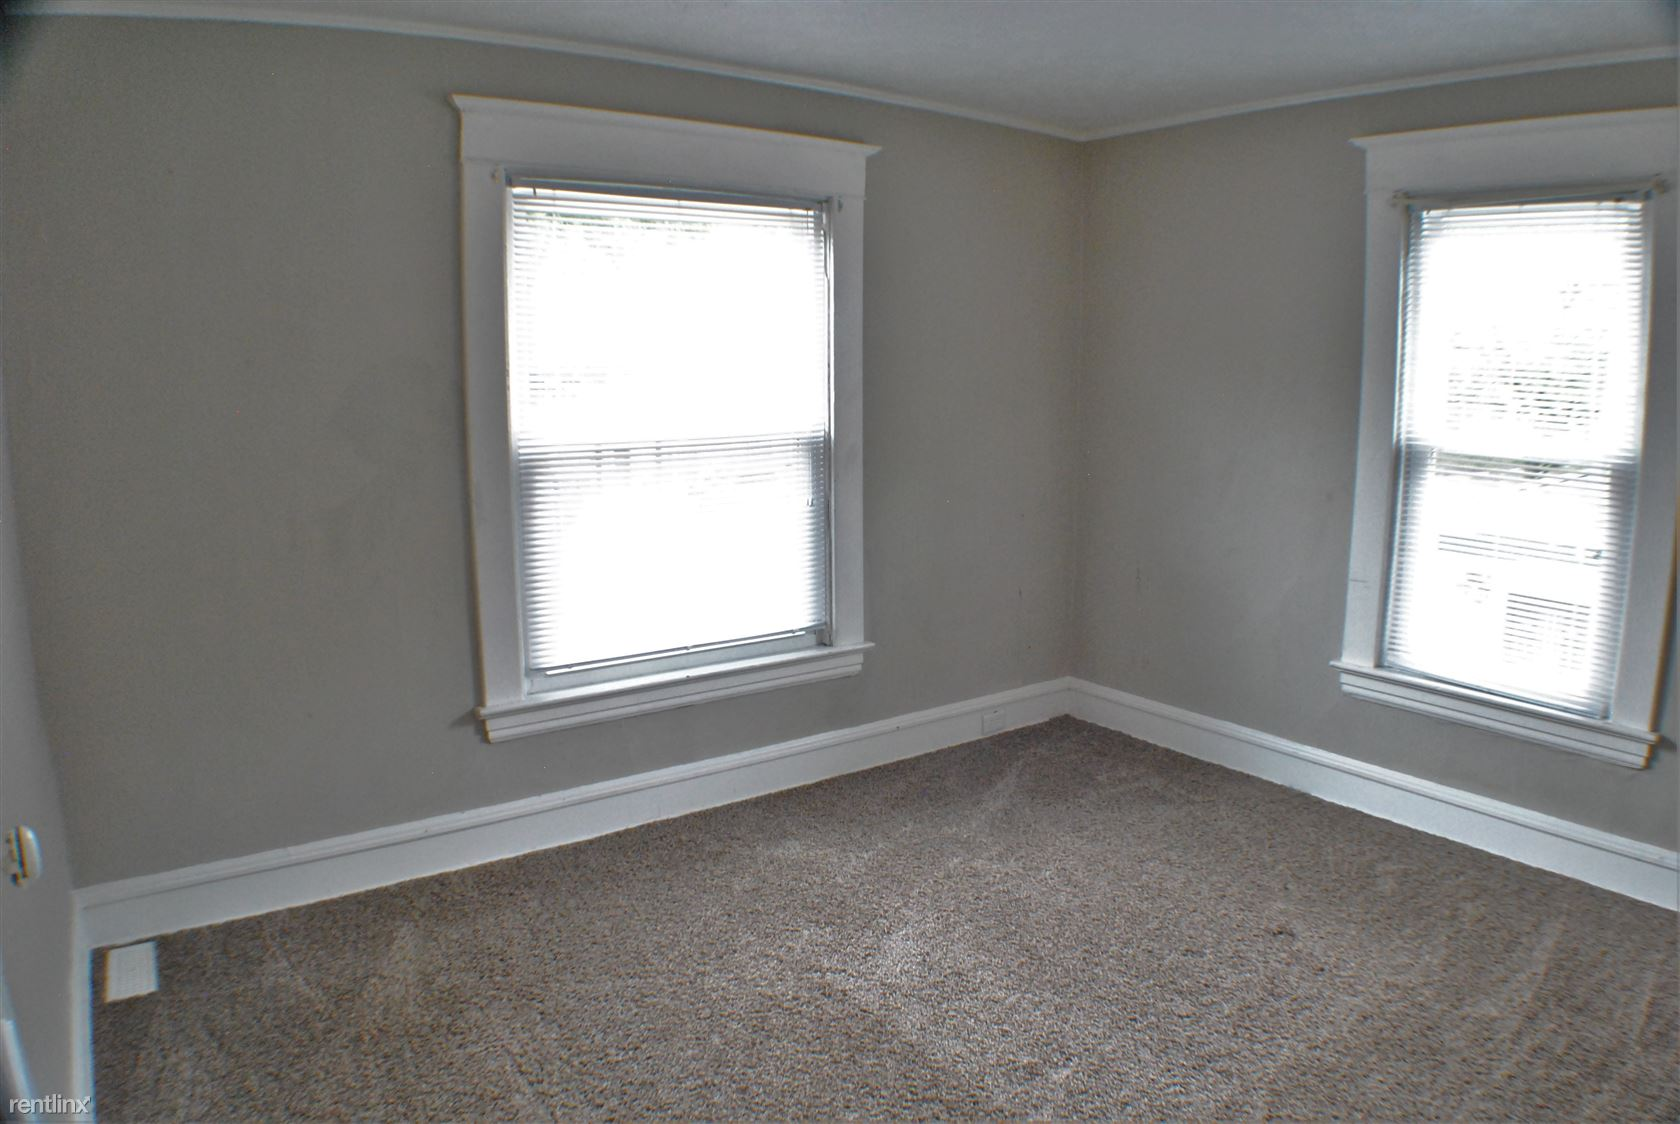 1050 Thomas - Bedroom #2